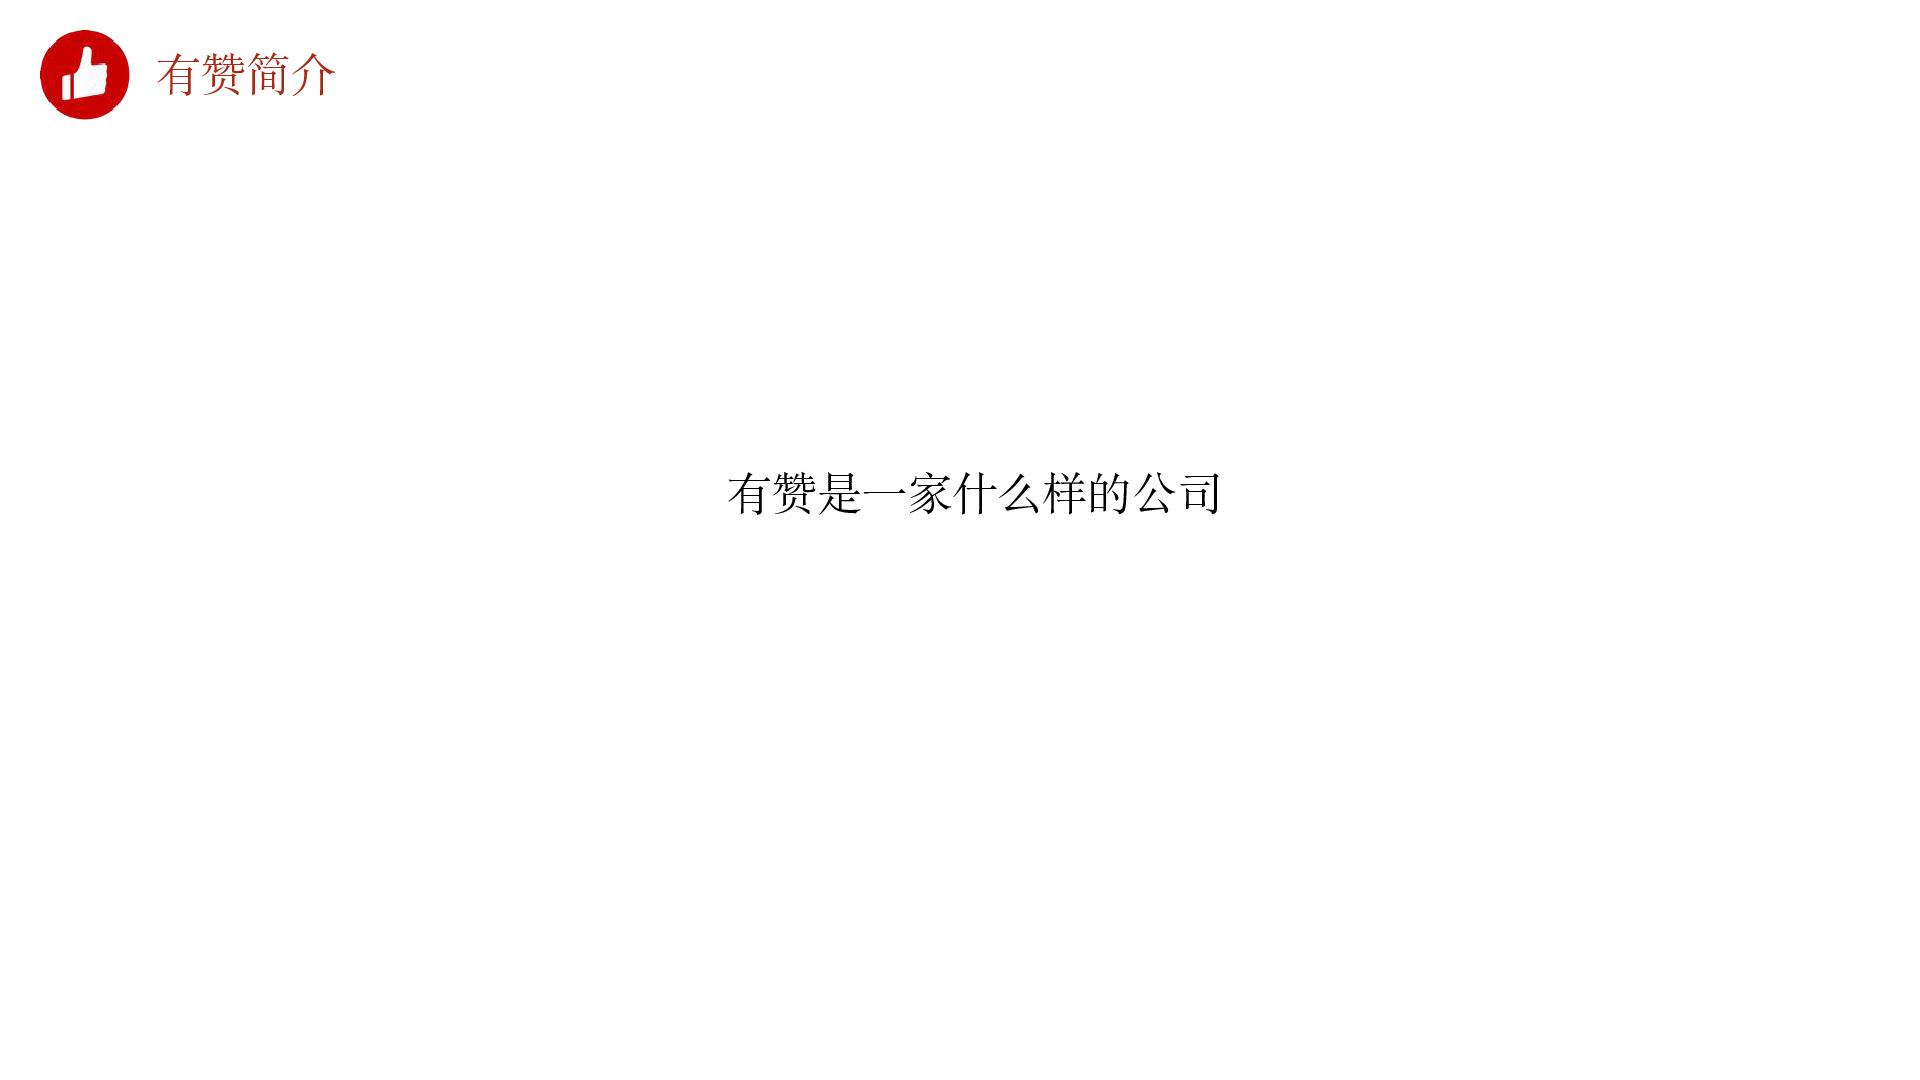 https://opentalk-blog.b0.upaiyun.com/prod/2020-12-28/1f6e42021cebc9c1efcf2a0a85637da7